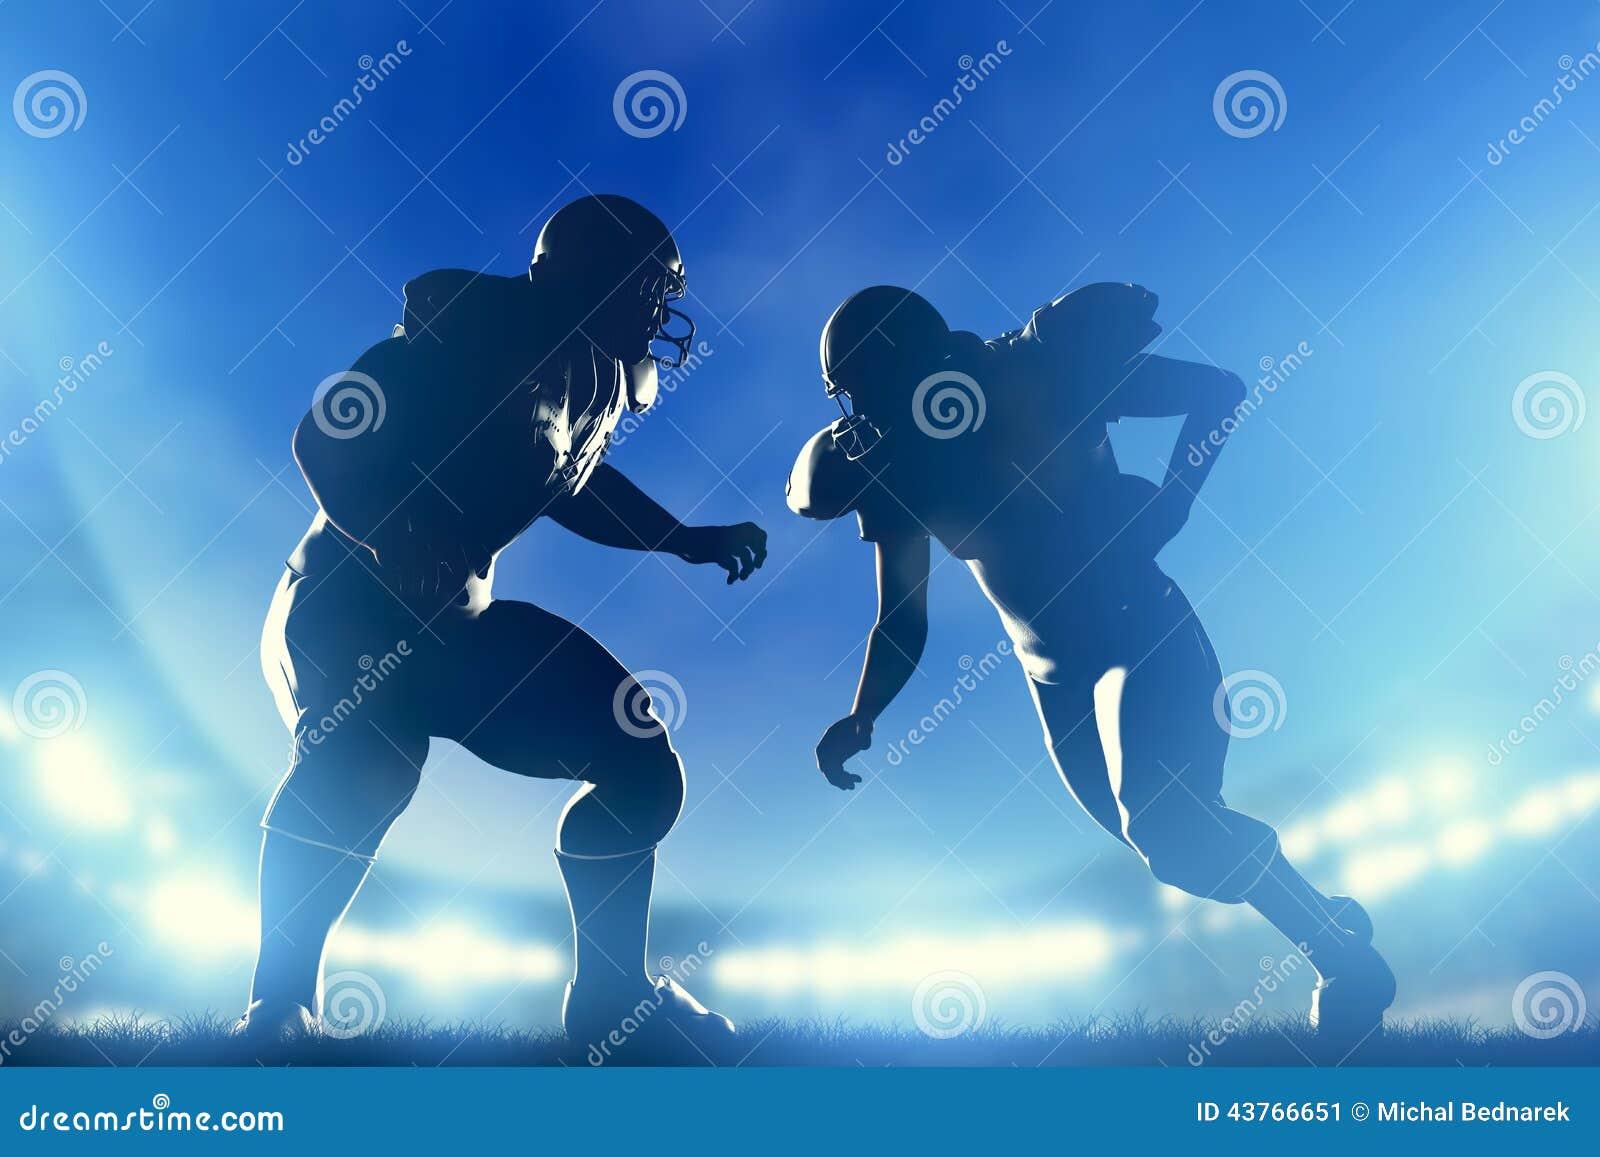 American football players in game, quarterback running. Stadium lights